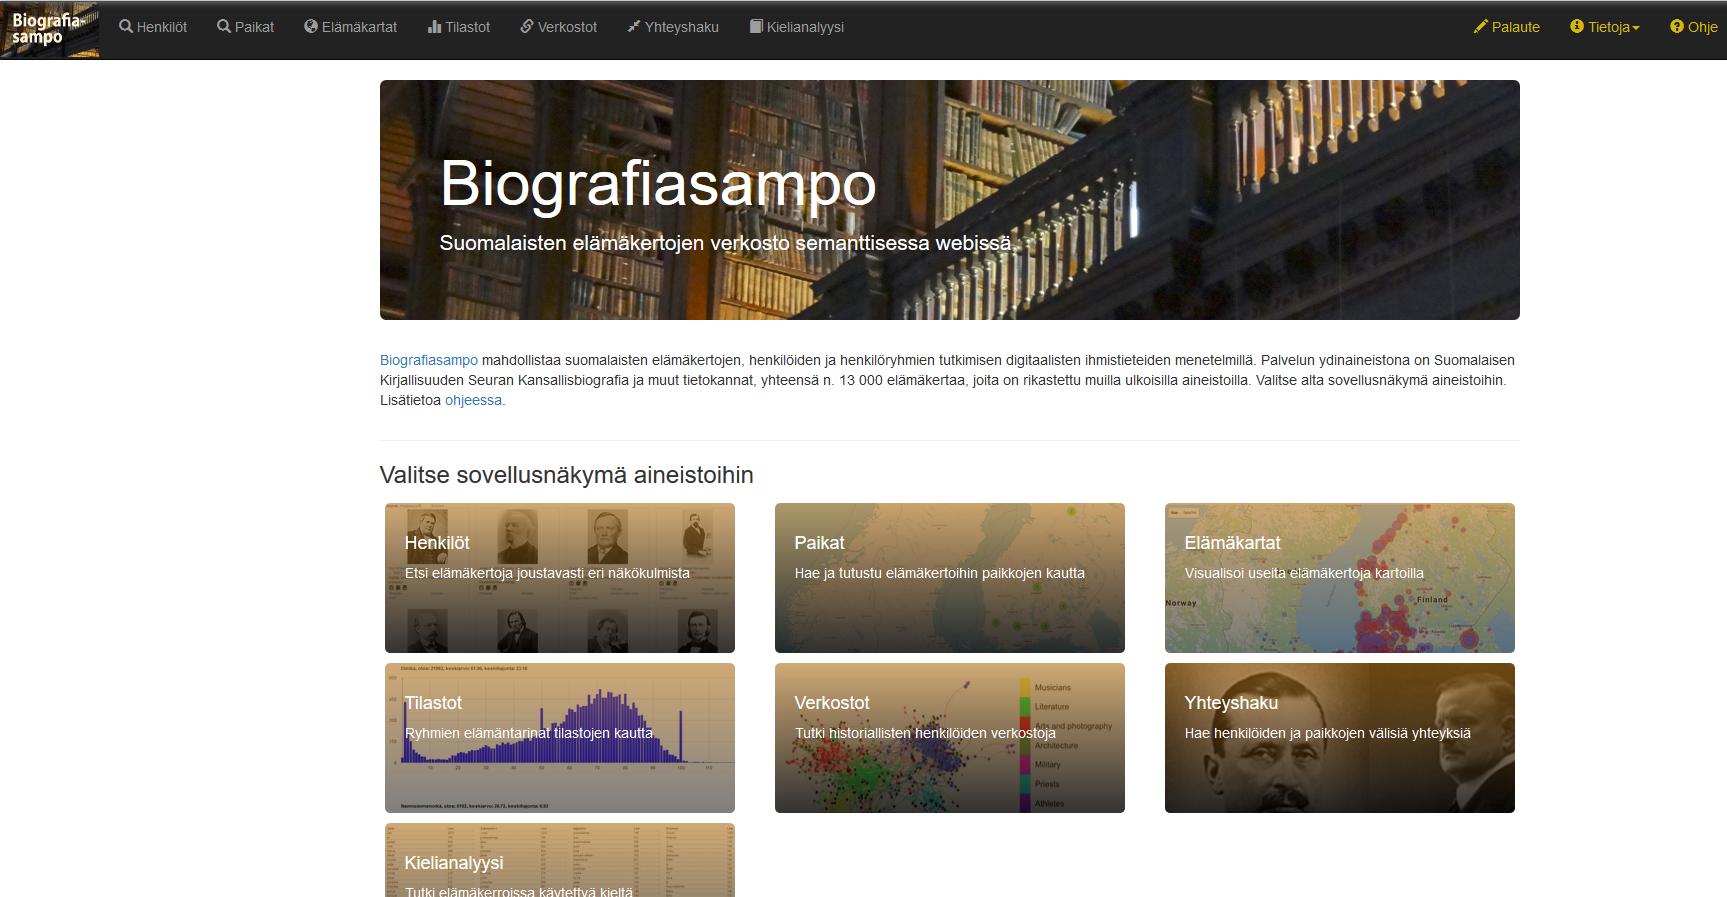 biografiasampo-suomalaiset-elamakerrat-semanttisessa-webissa